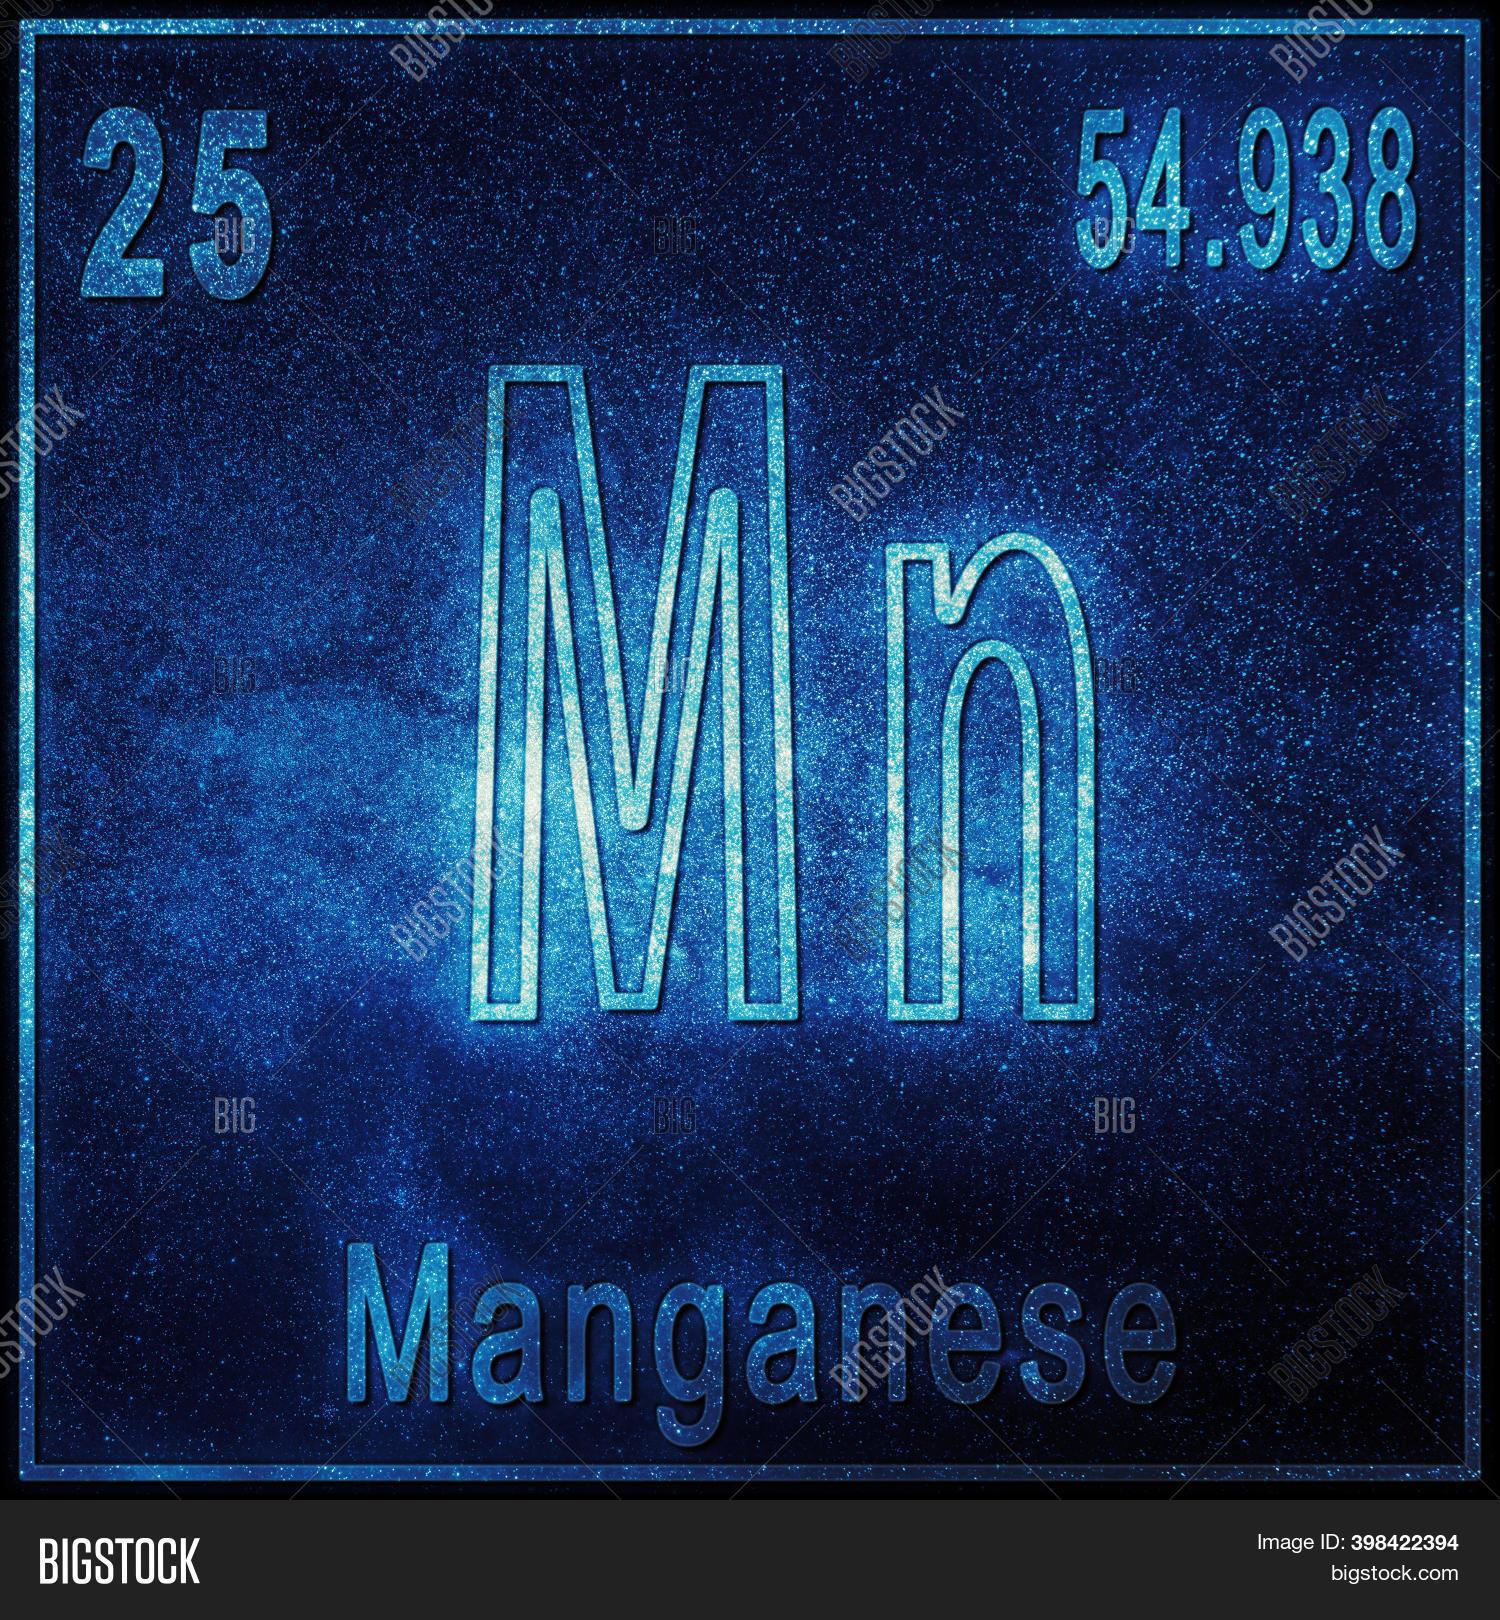 Atomic number for manganese dioxide